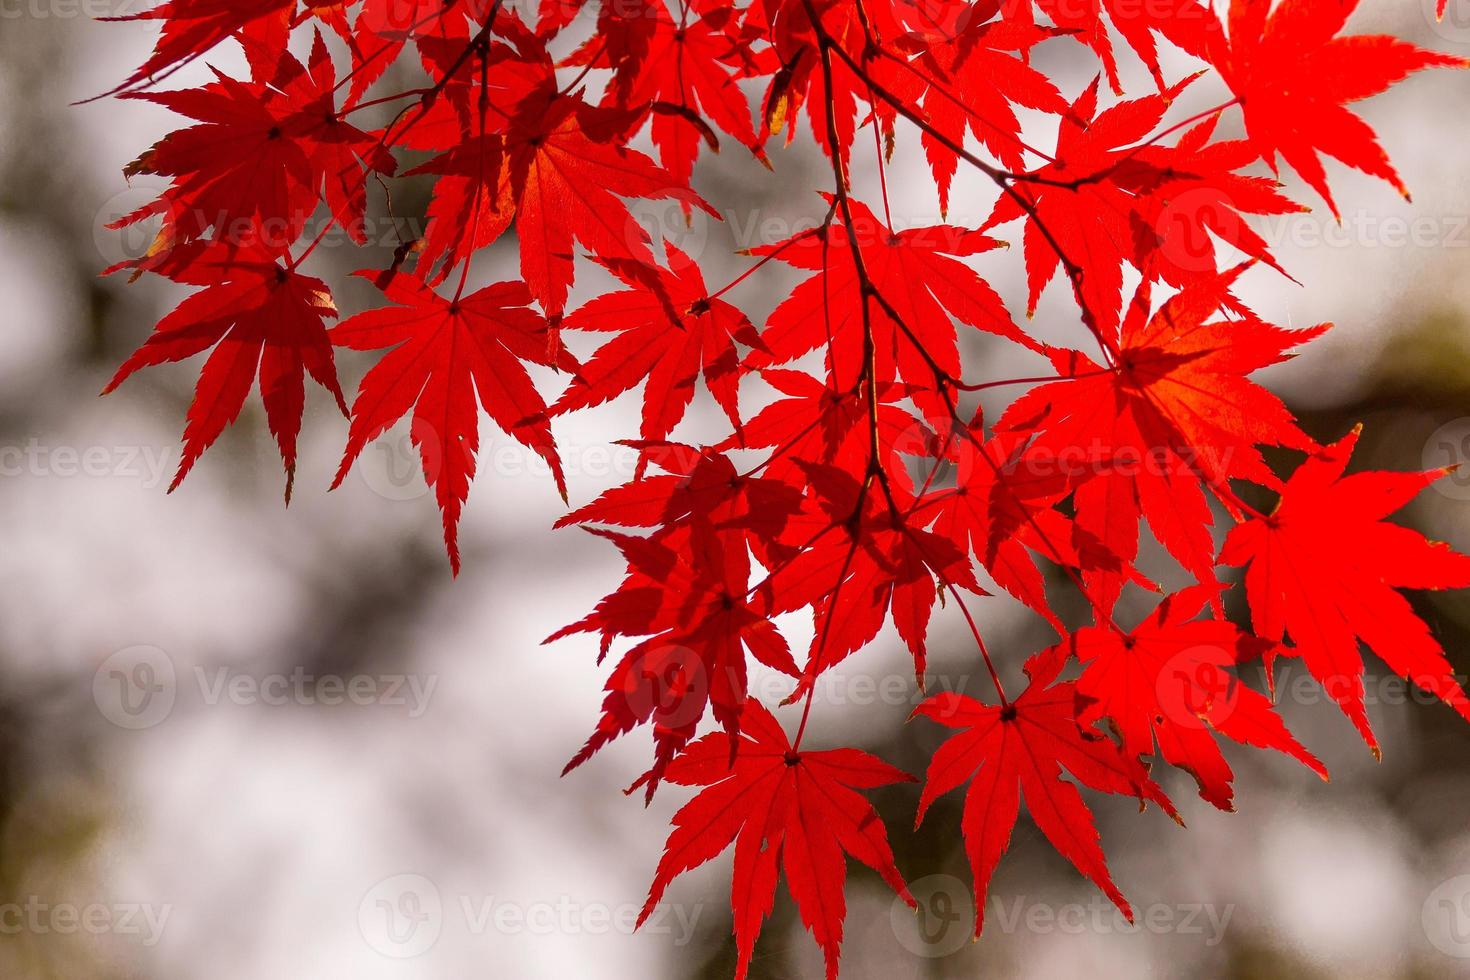 Autumn foliage photo